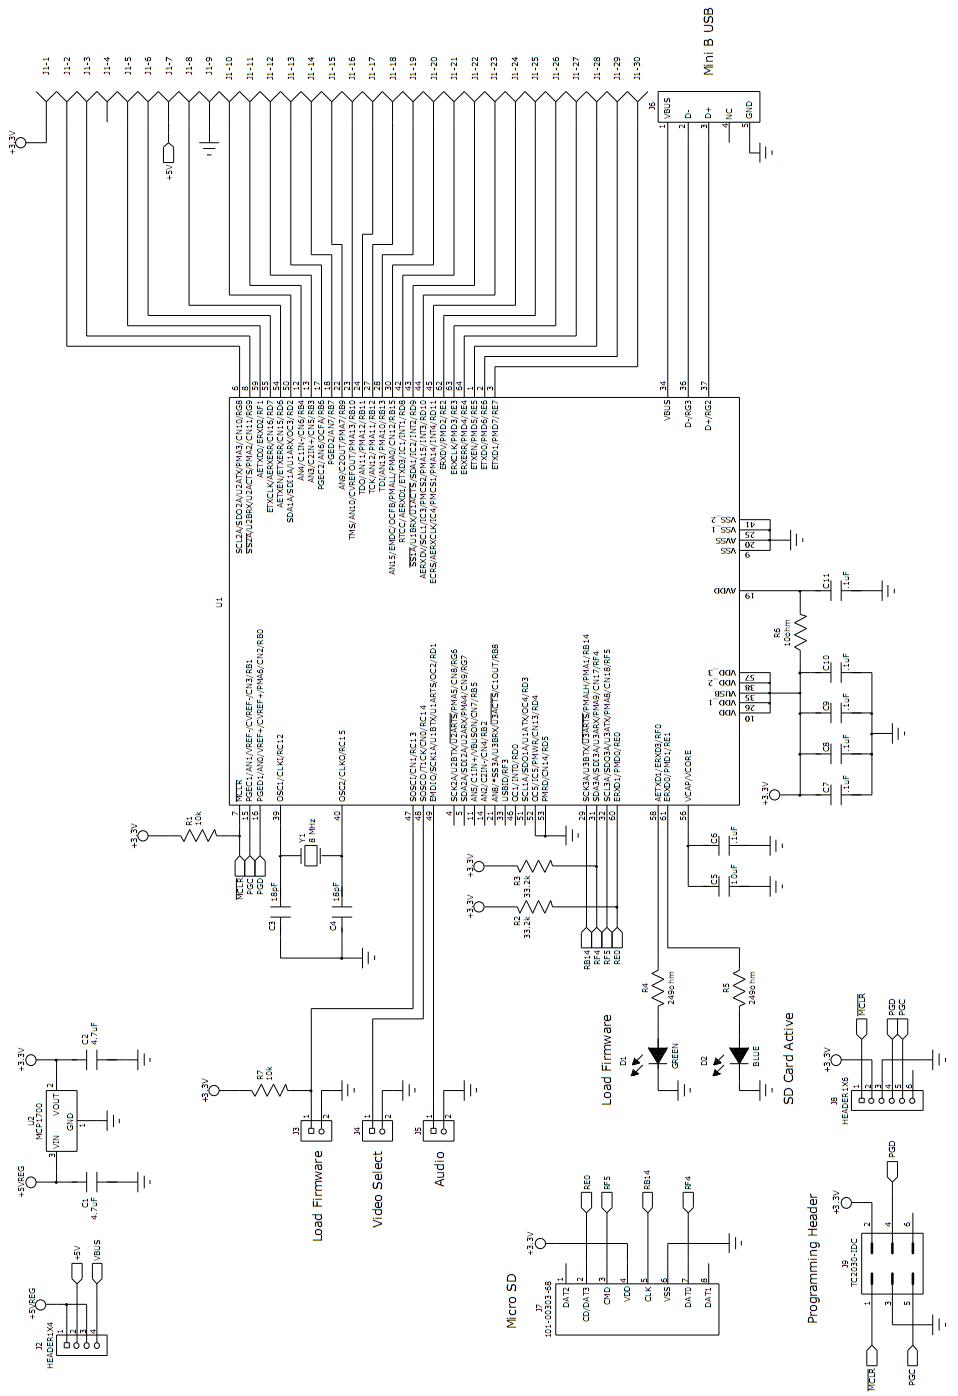 CGMMSTICK1 Schematic